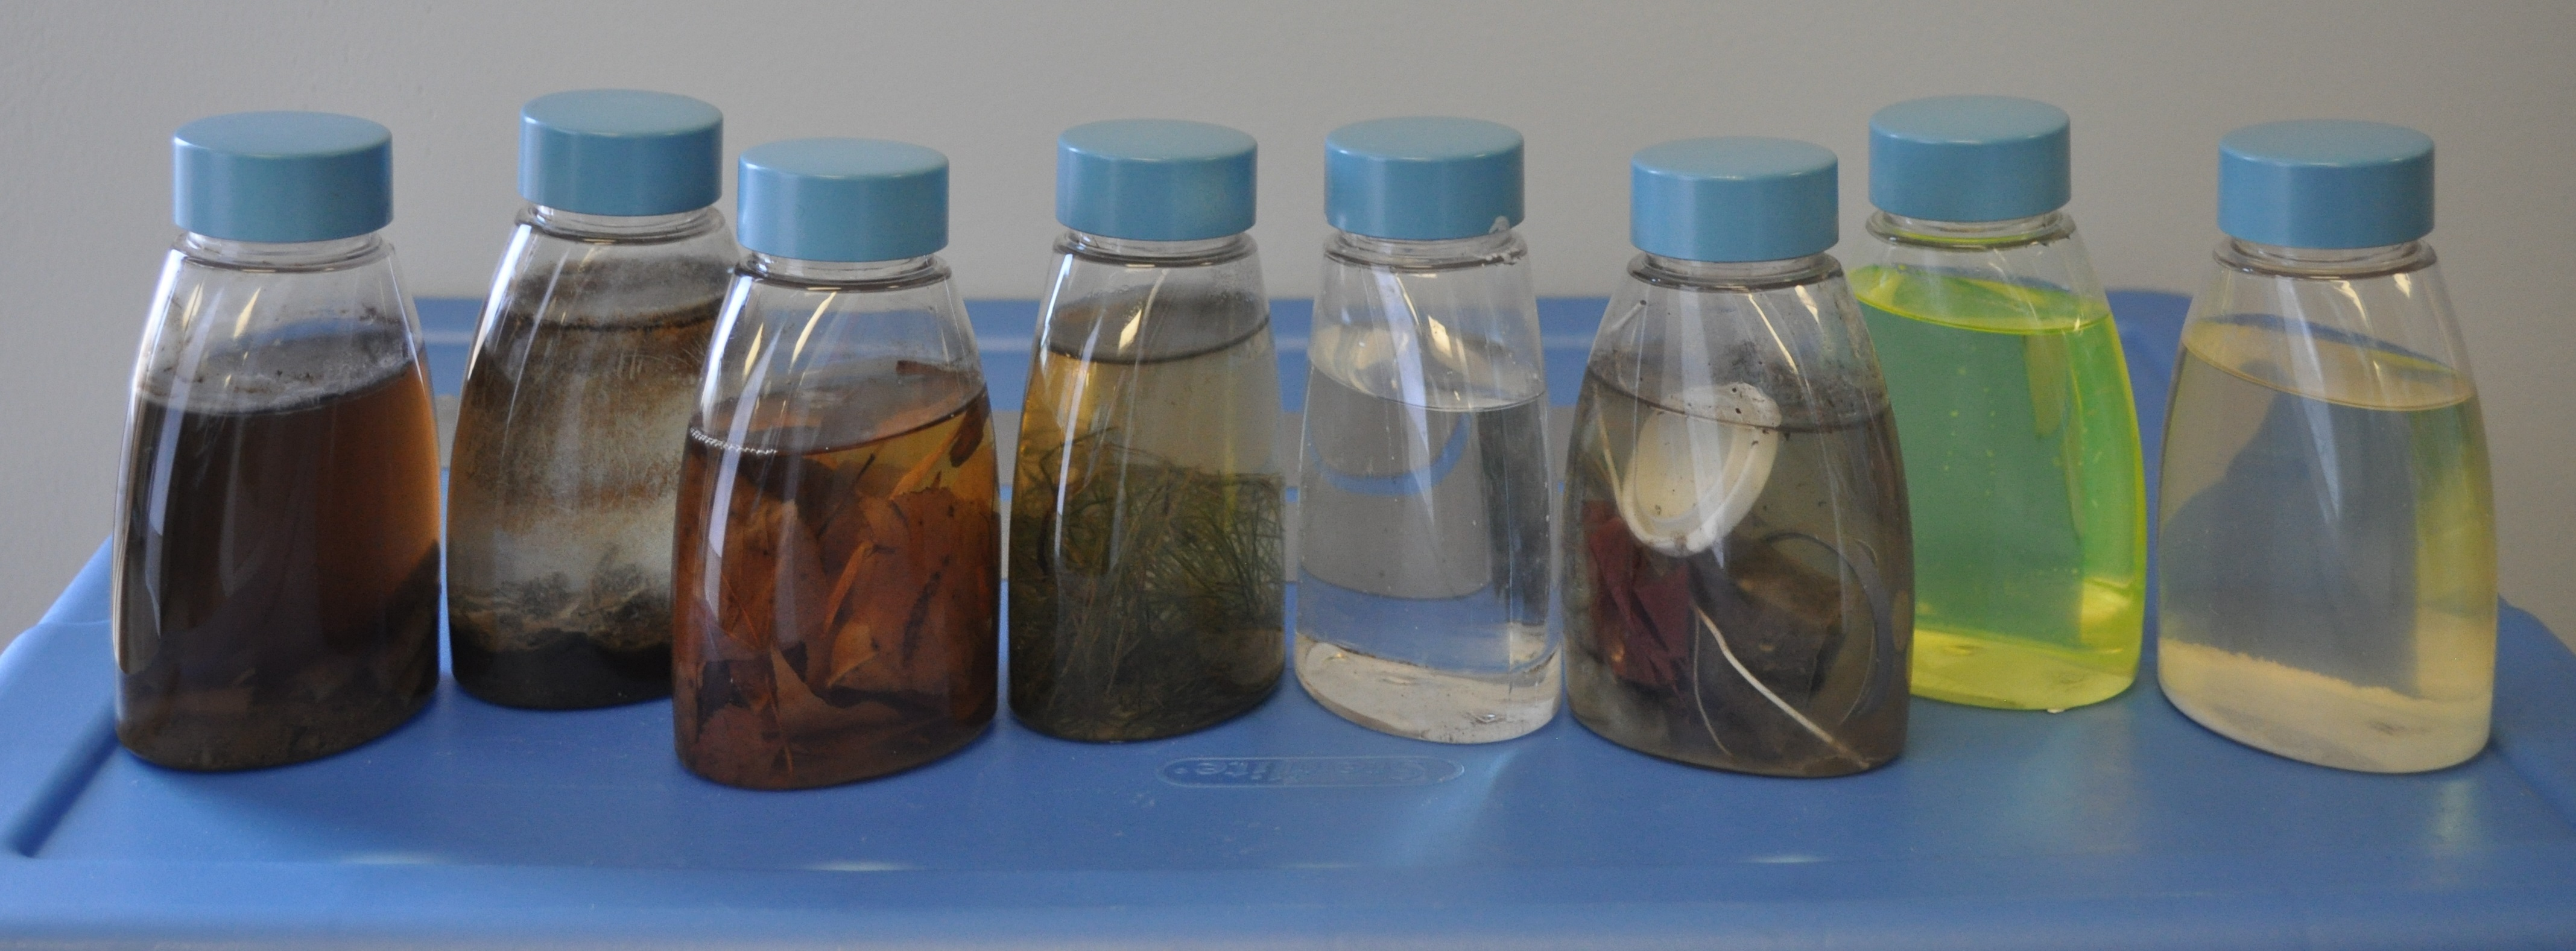 pollutant bottles